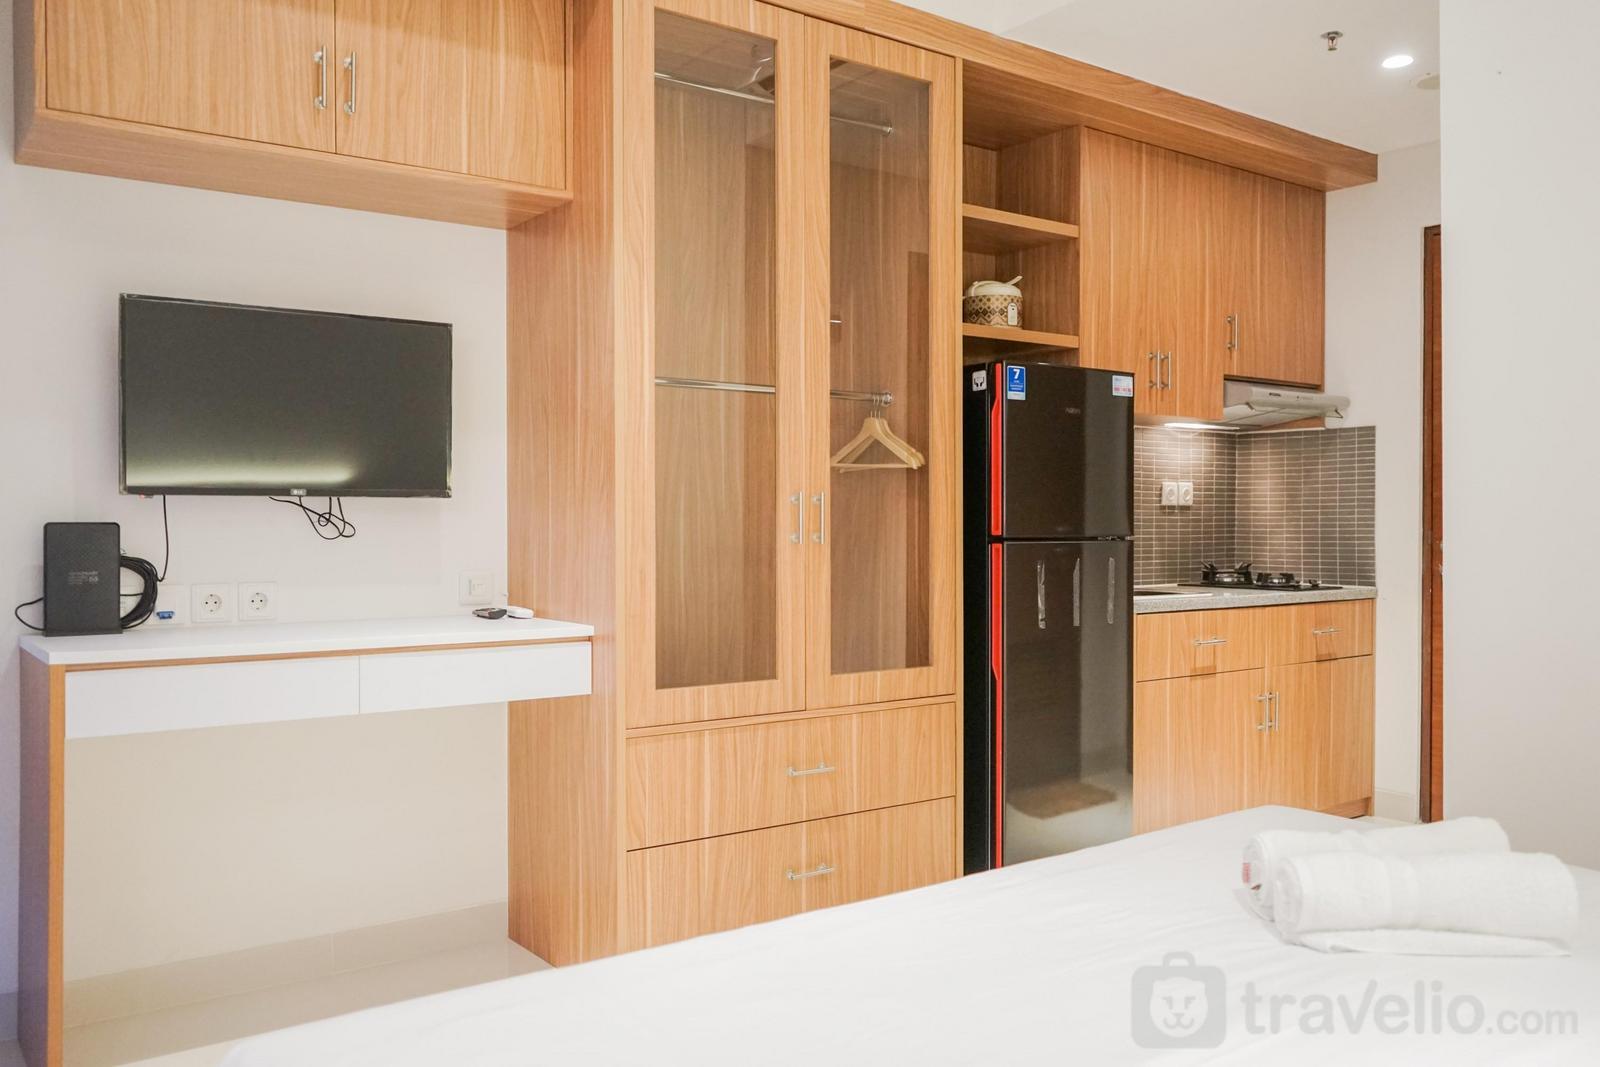 Apartemen Roseville (Soho & Suite) - Graceful Studio Room at Roseville Apartment By Travelio